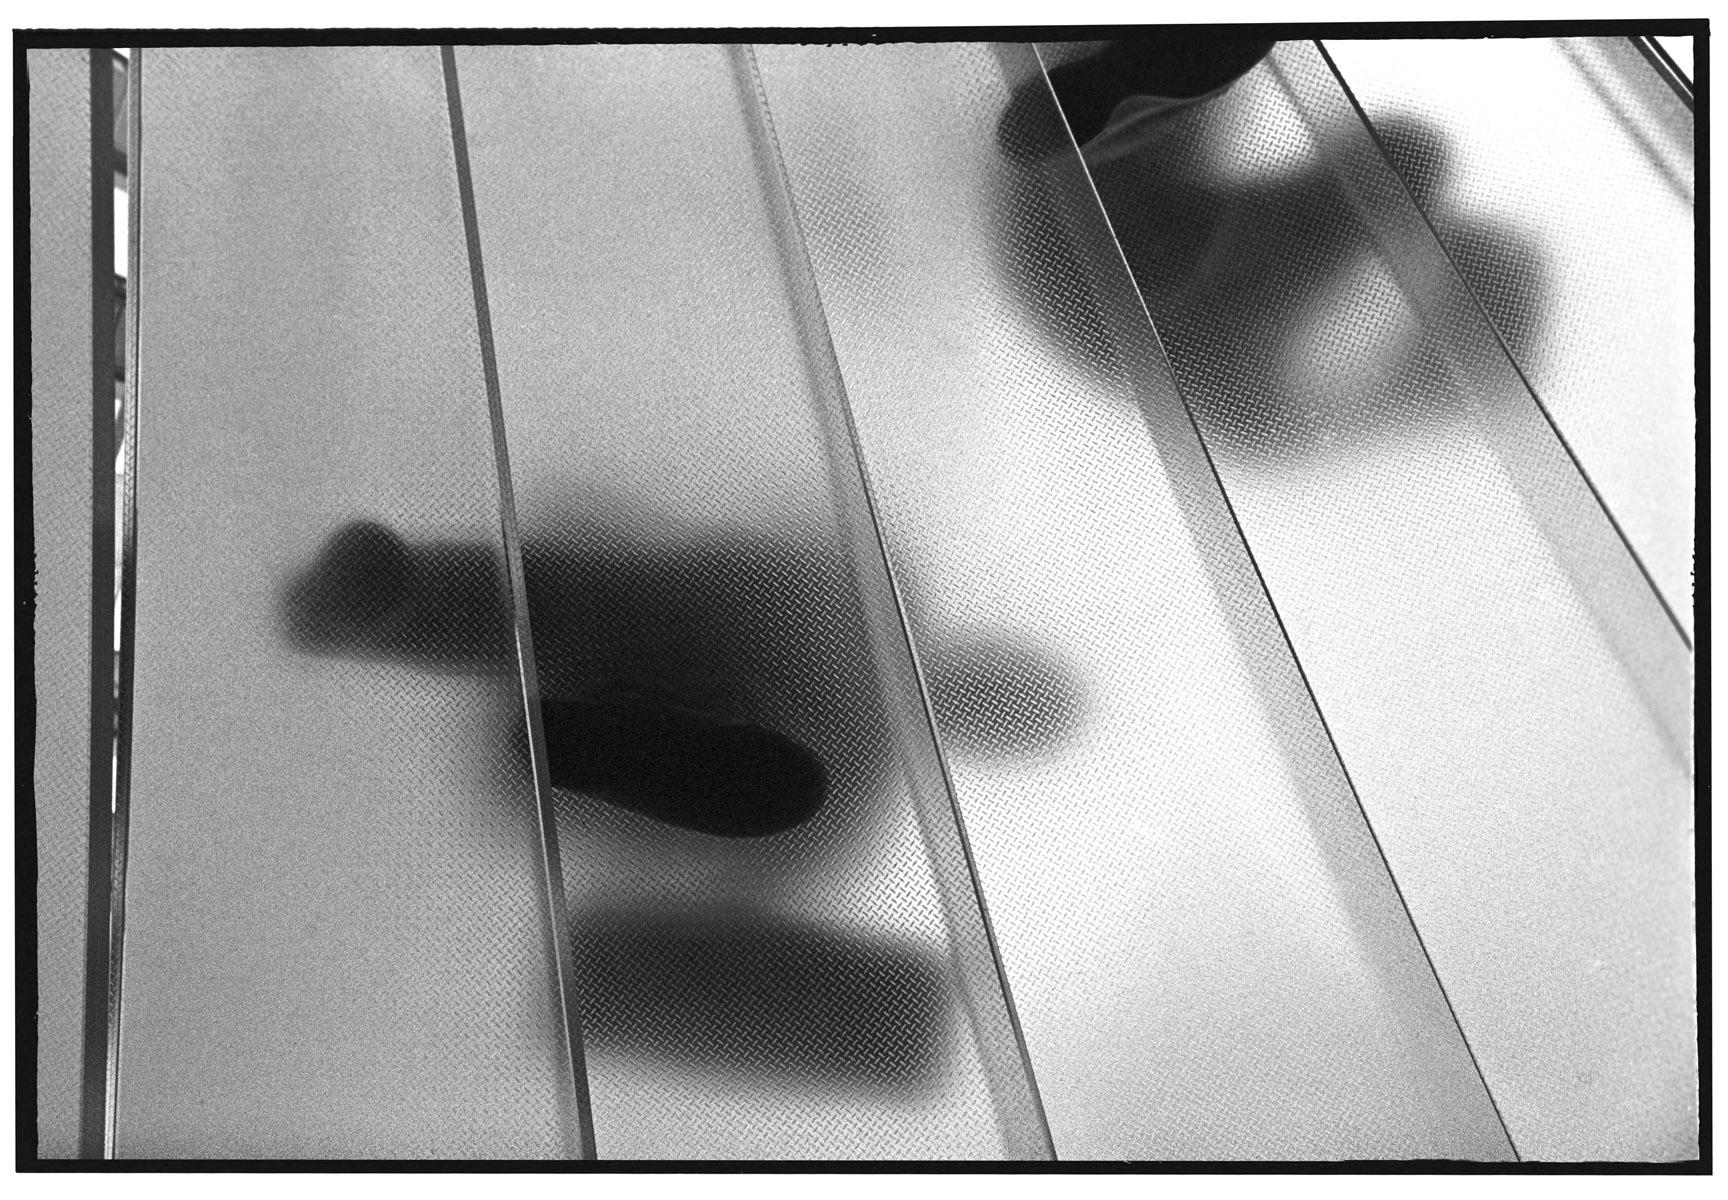 Underfoot_03.jpg